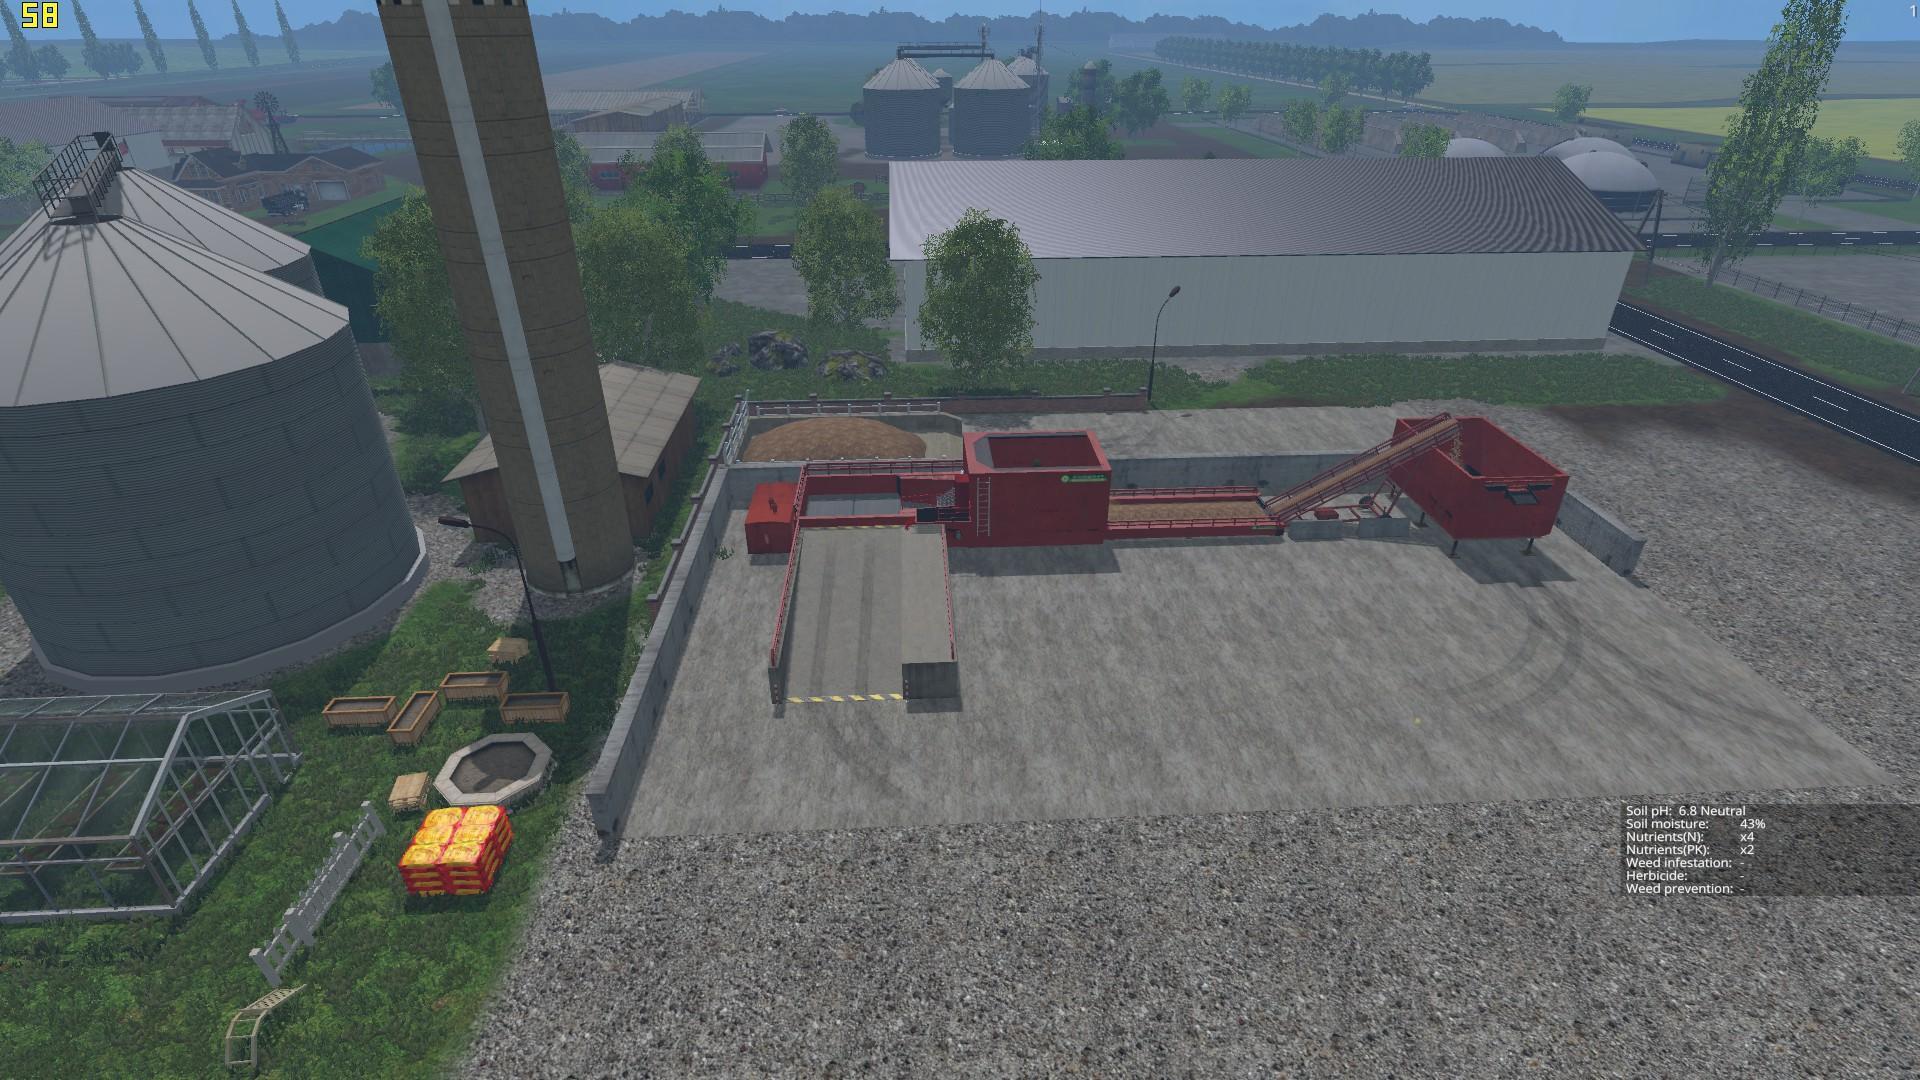 STATES MAP V Farming Simulator LS Mod - Farming simulator 2015 us map feed cows